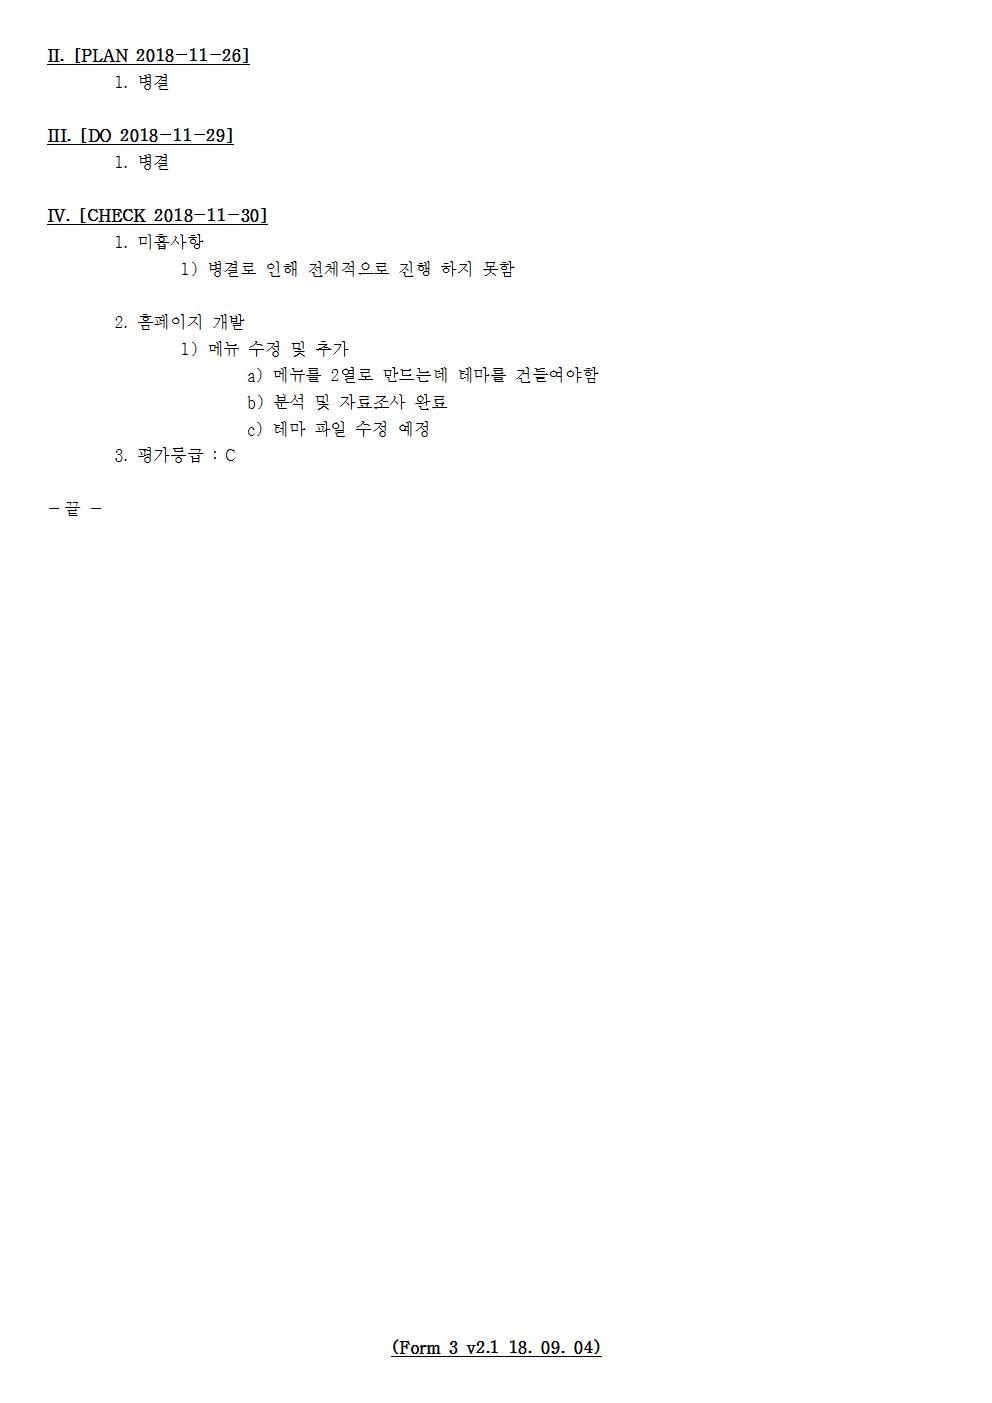 D-[18-047-BZ-07]-[BZEN HP v3.0]-[2018-11-30][HH]002.jpg